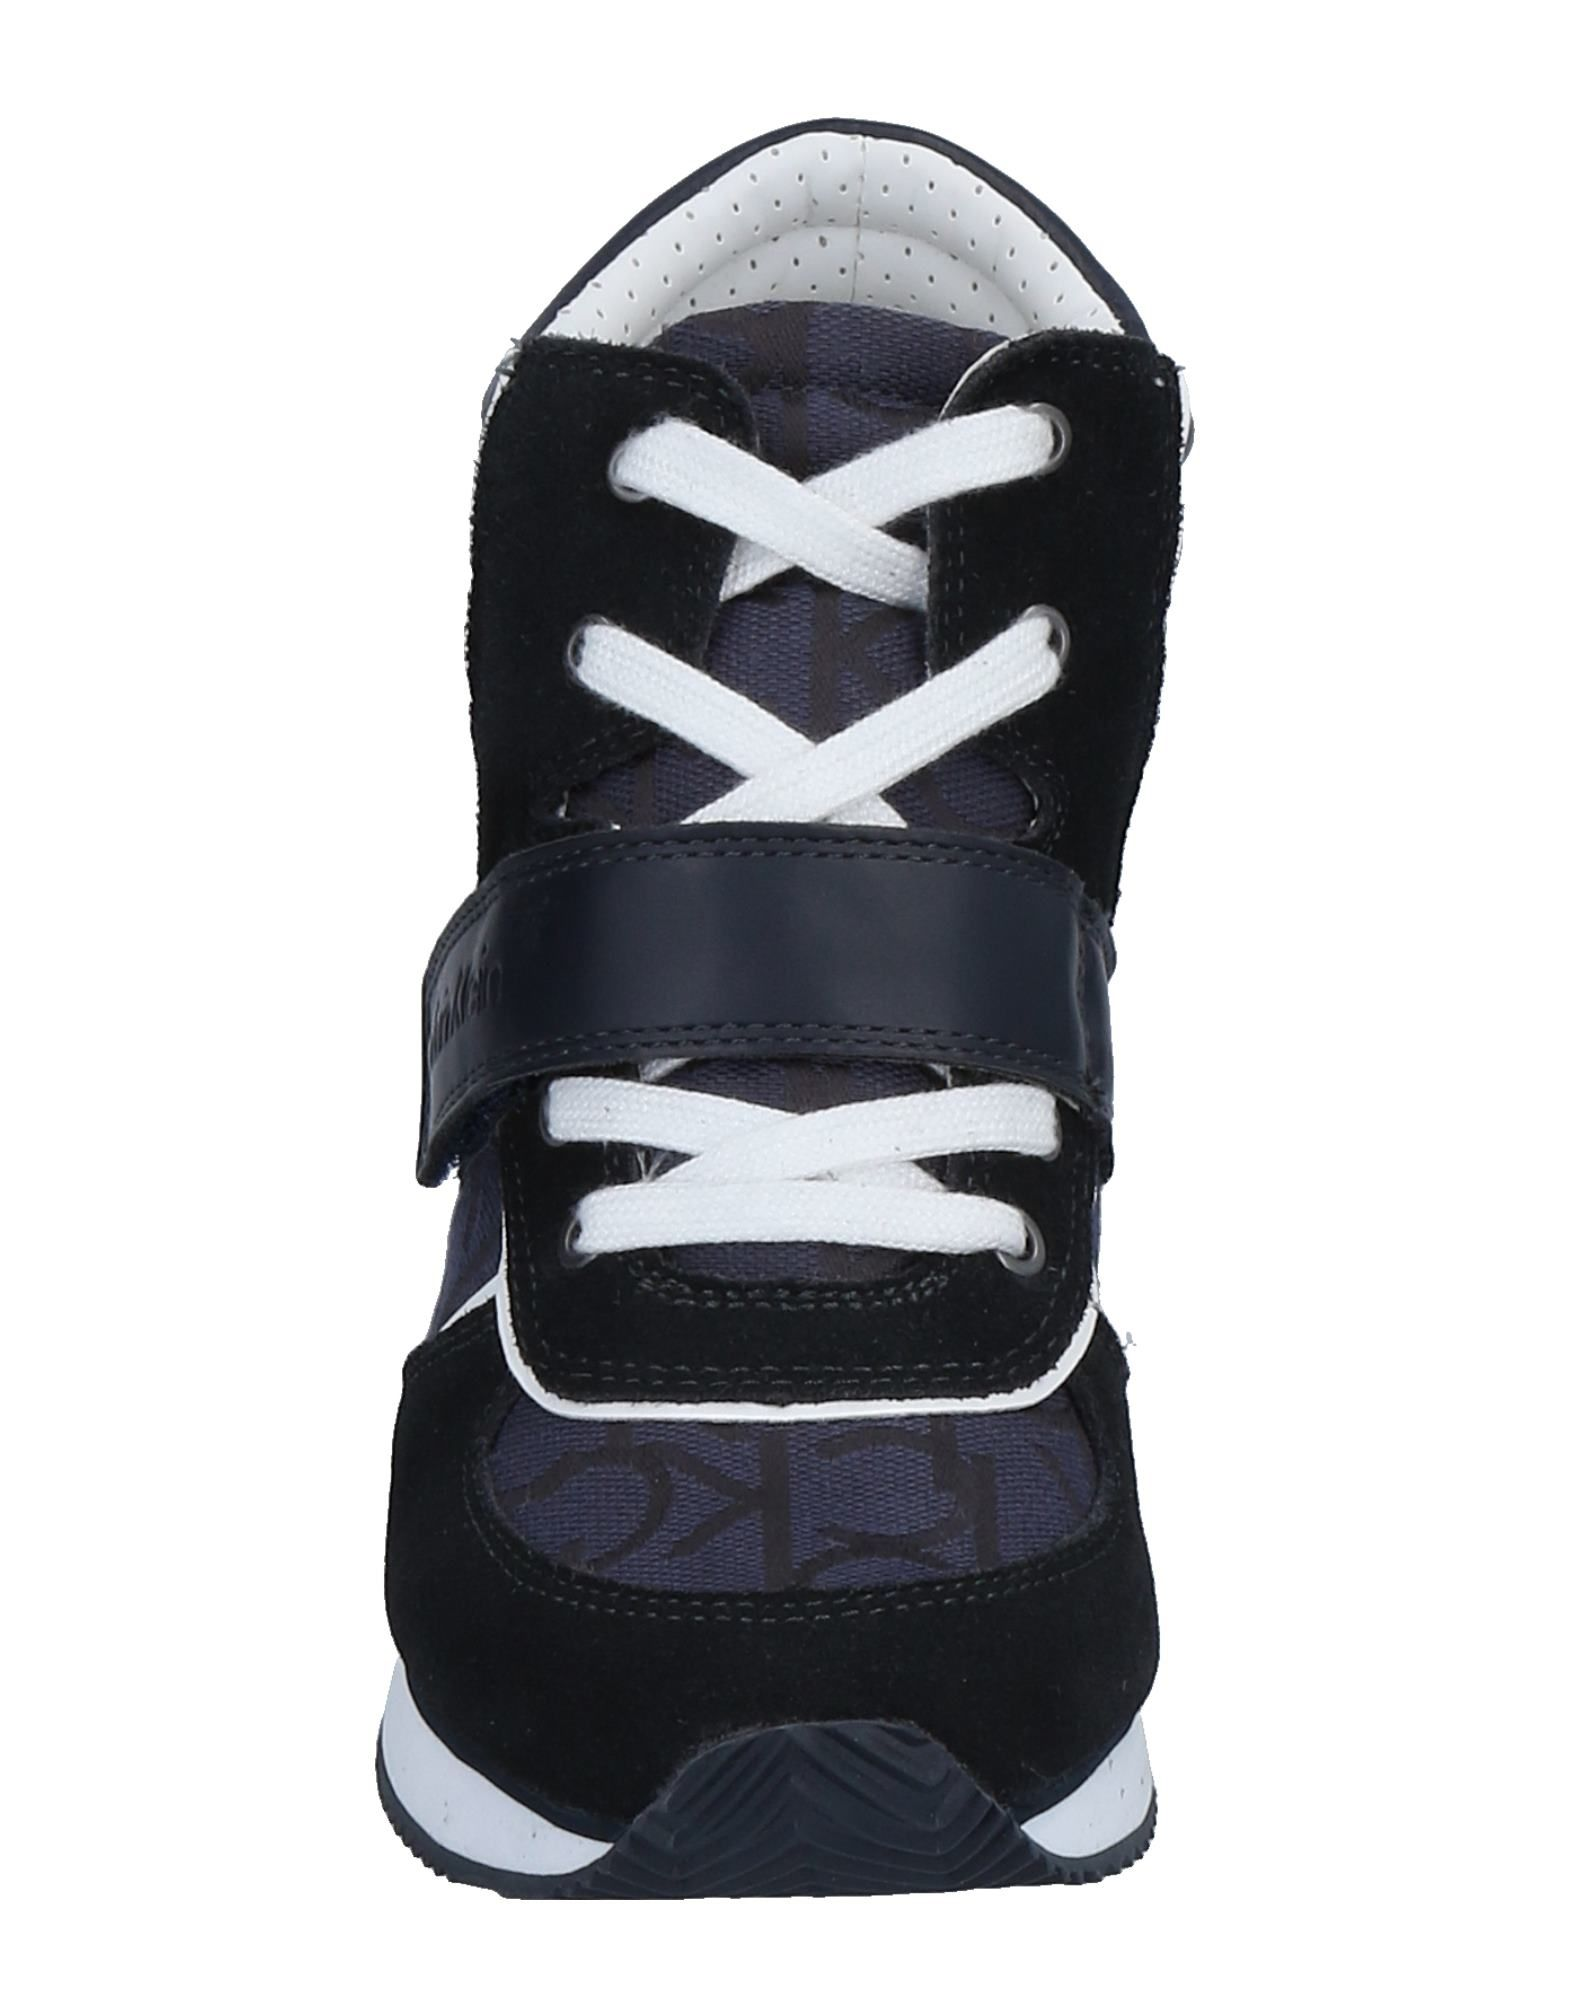 Calvin Klein Jeans Sneakers Damen  11514403LC Gute Qualität beliebte Schuhe